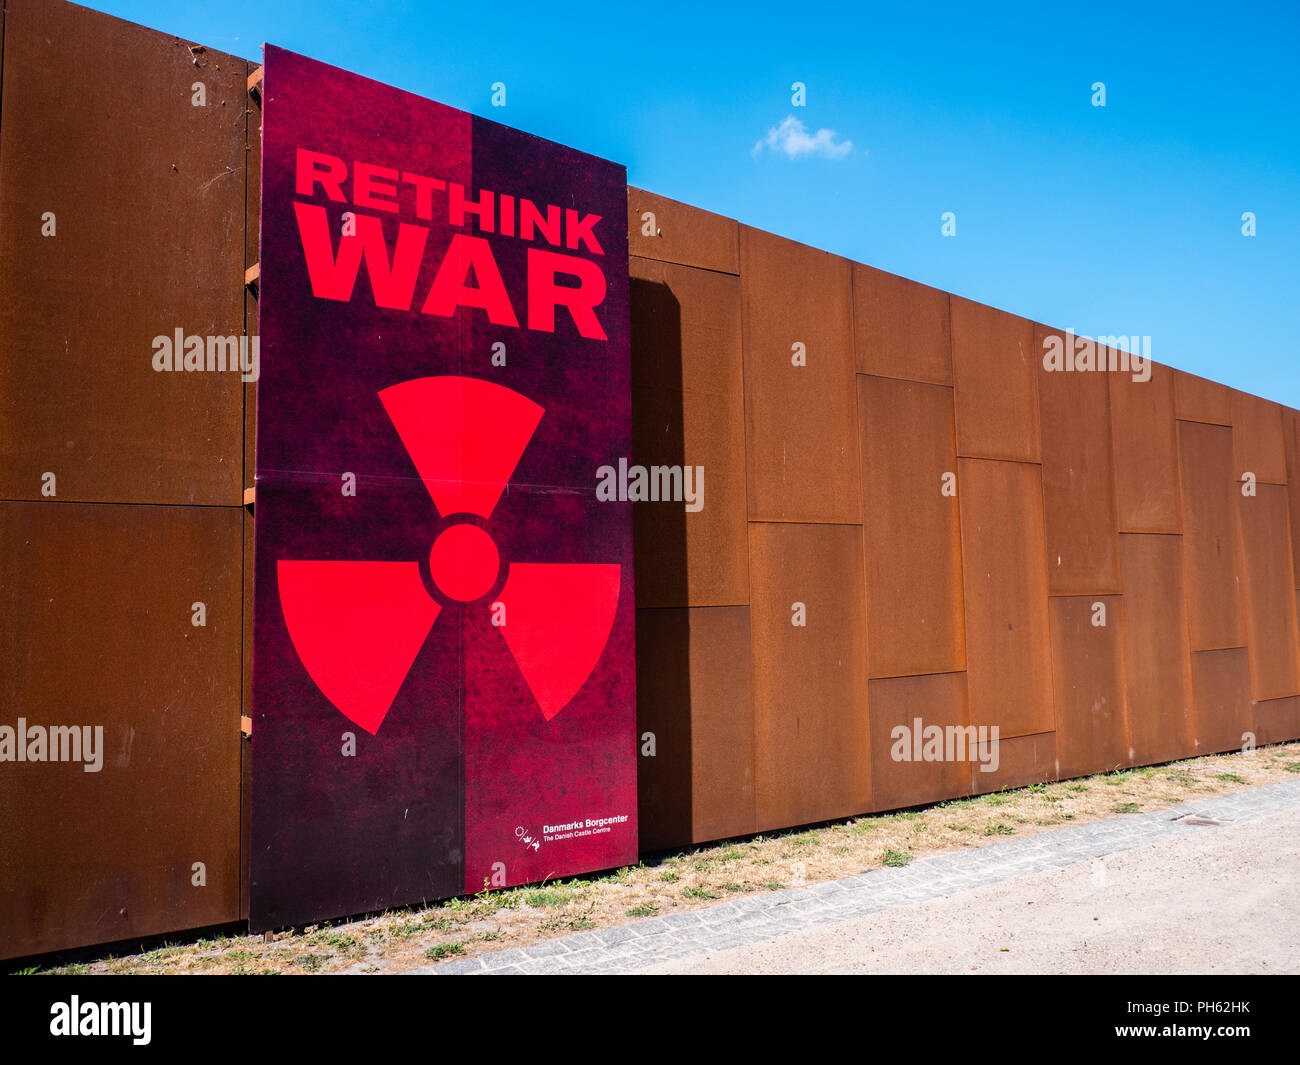 Rethink War Exhibition, Vordingborg Castle, Vordingborg, Zealand, Denmark, Europe. - Stock Image